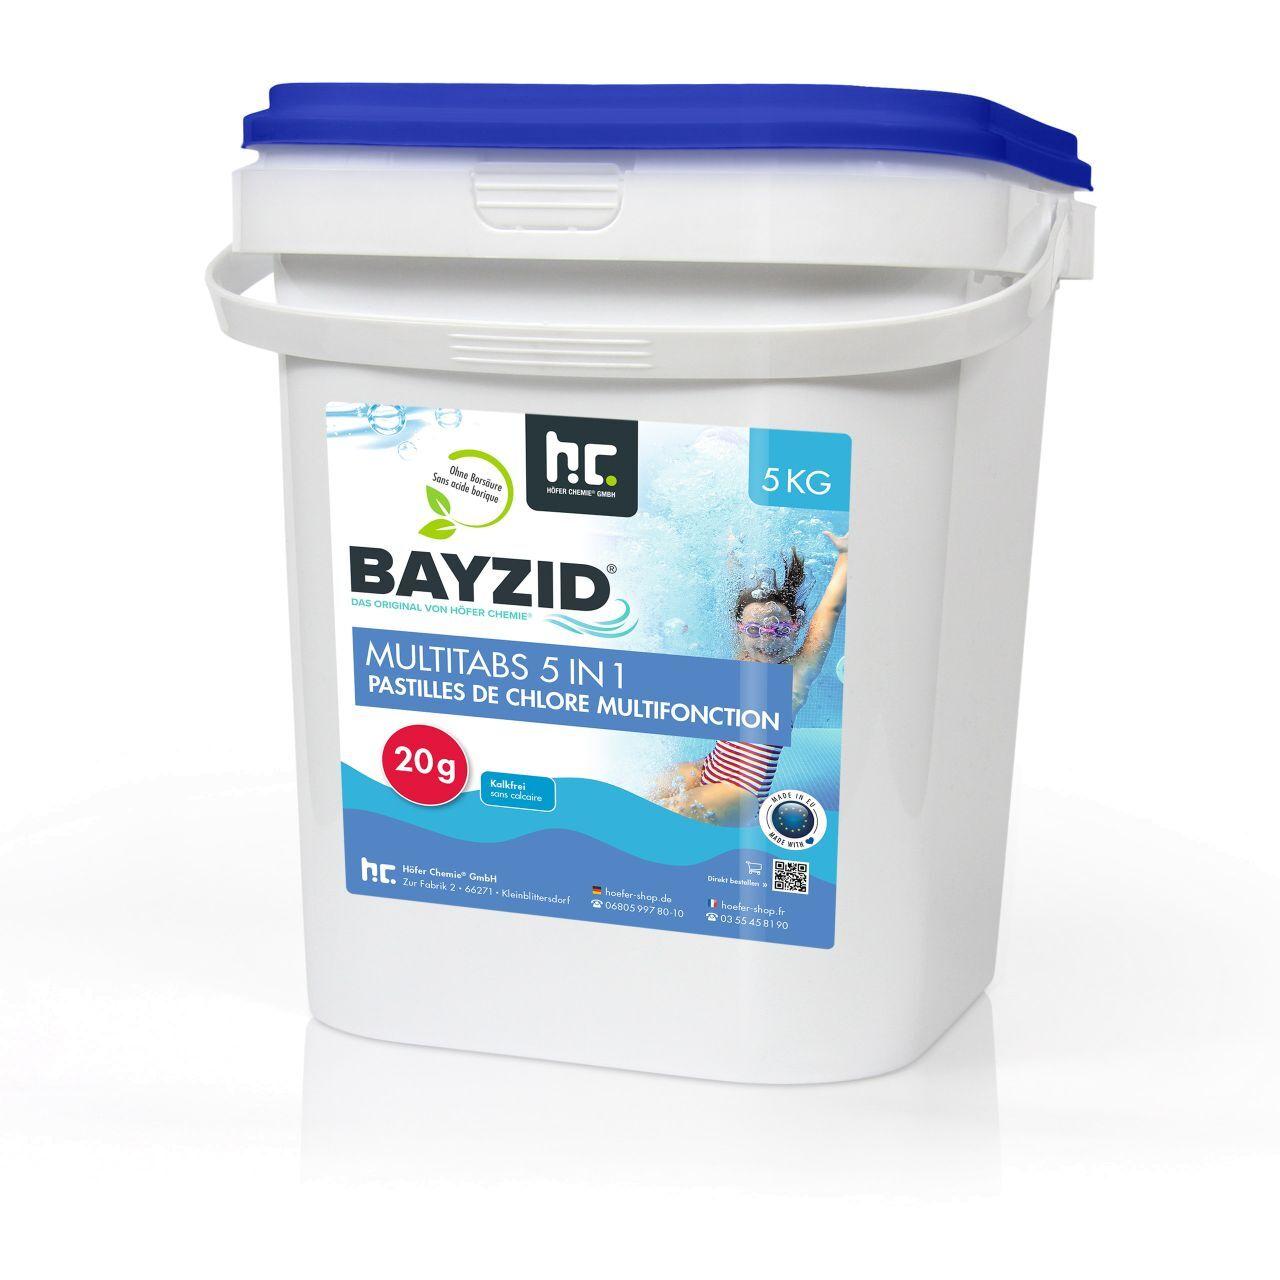 BAYZID 5 kg Bayzid® Pastilles de chlore multifonction (20g) (1 x 5 kg)